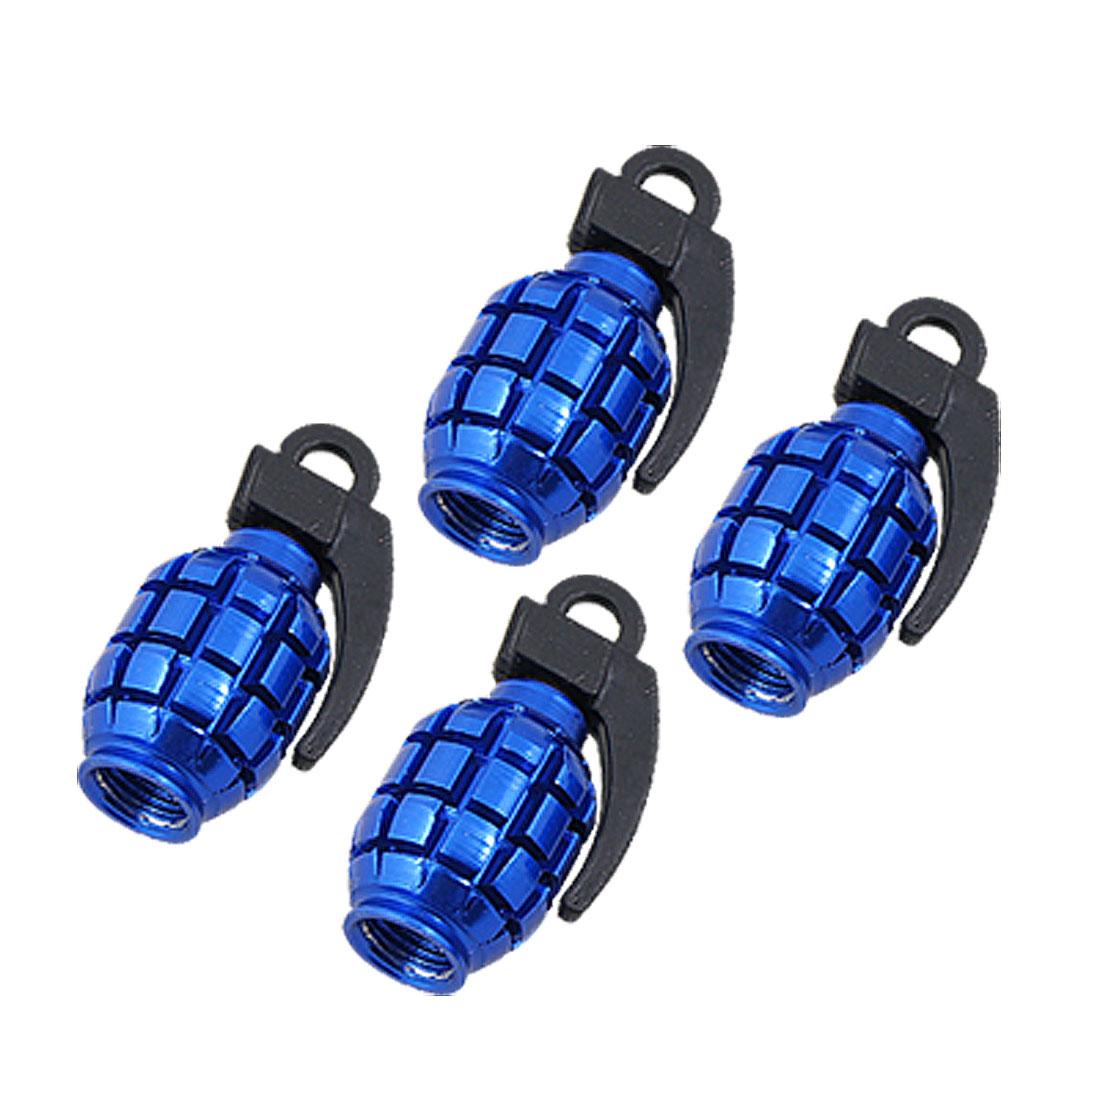 Car Tire Valve Caps Royal Blue Metal Plastic Cover 4 PCS